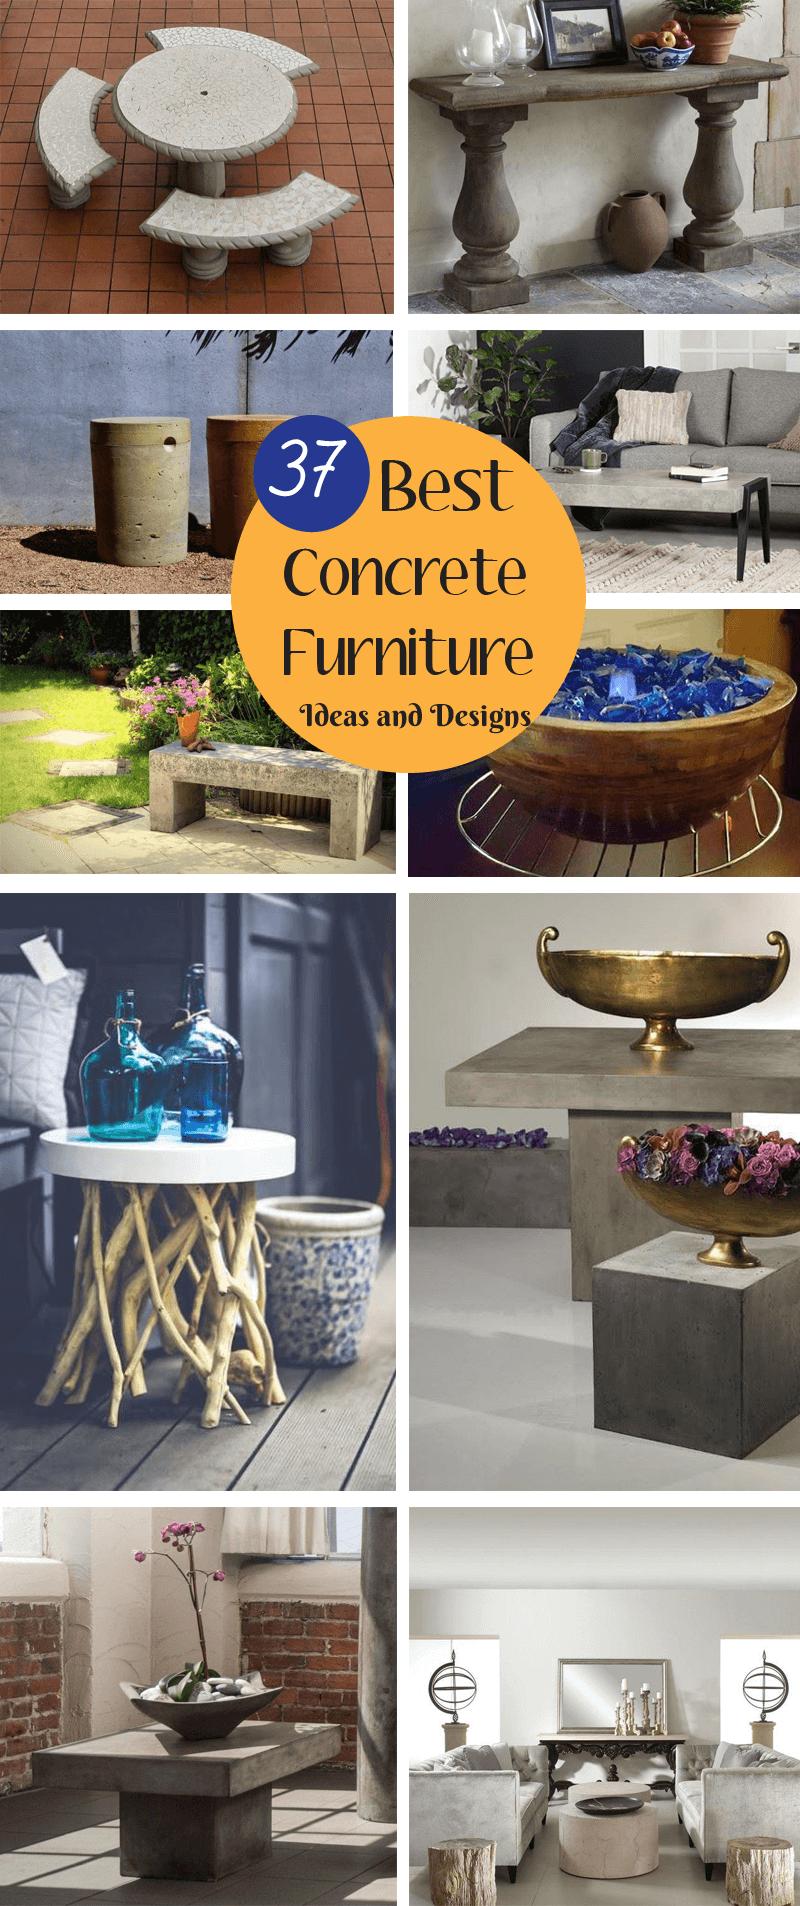 best concrete furniture ideas and designs